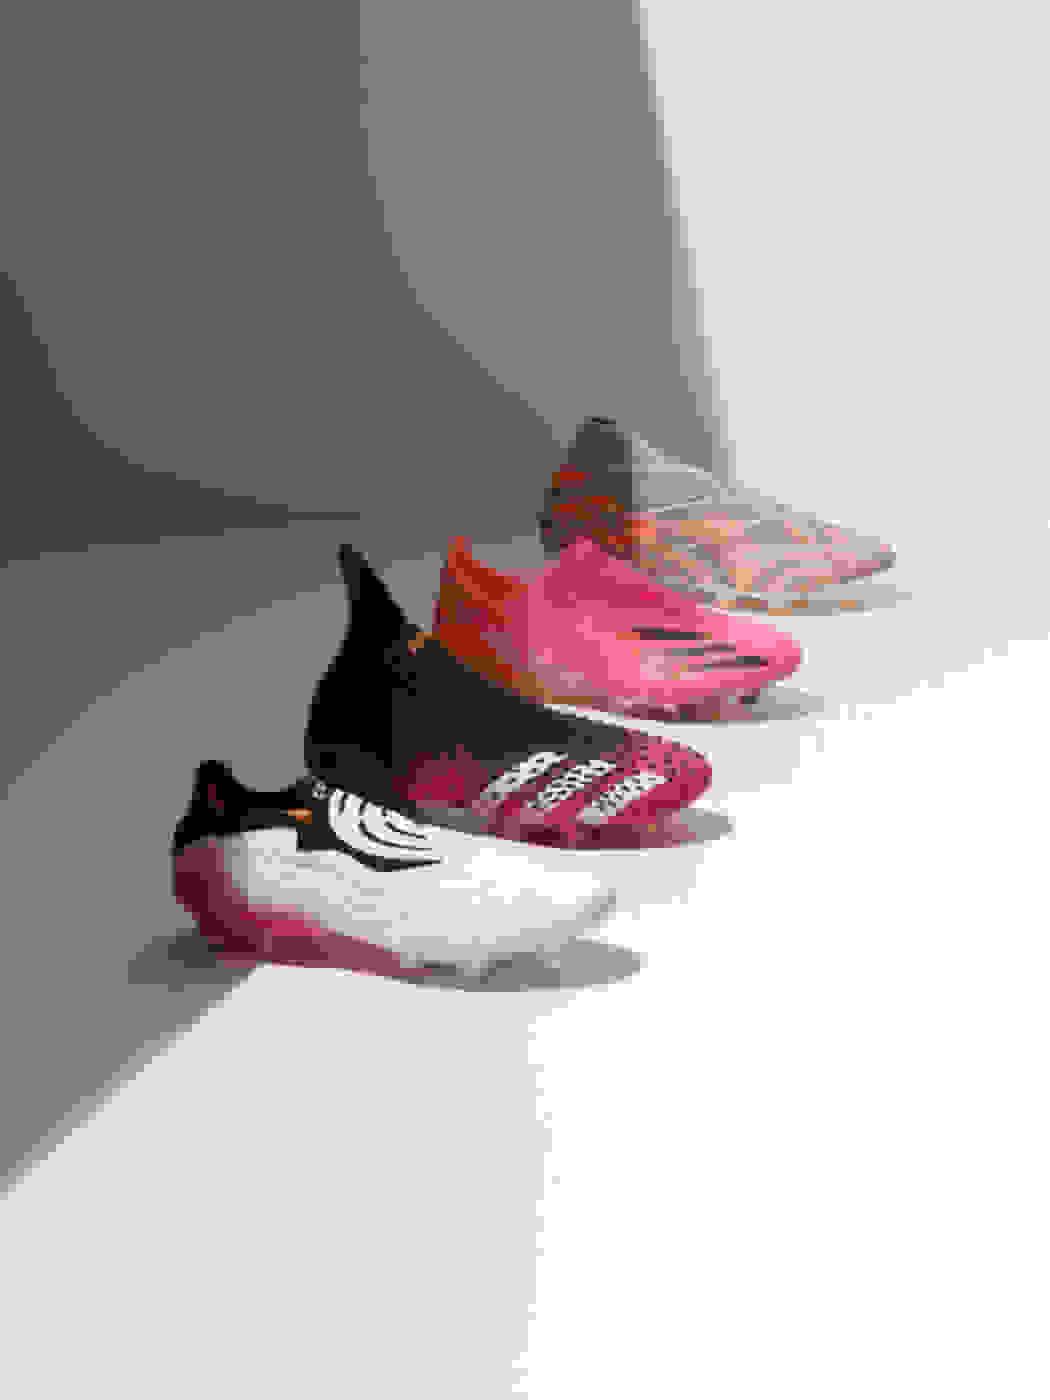 Image featuring the Predator, Nemeziz, X and Copa boots.